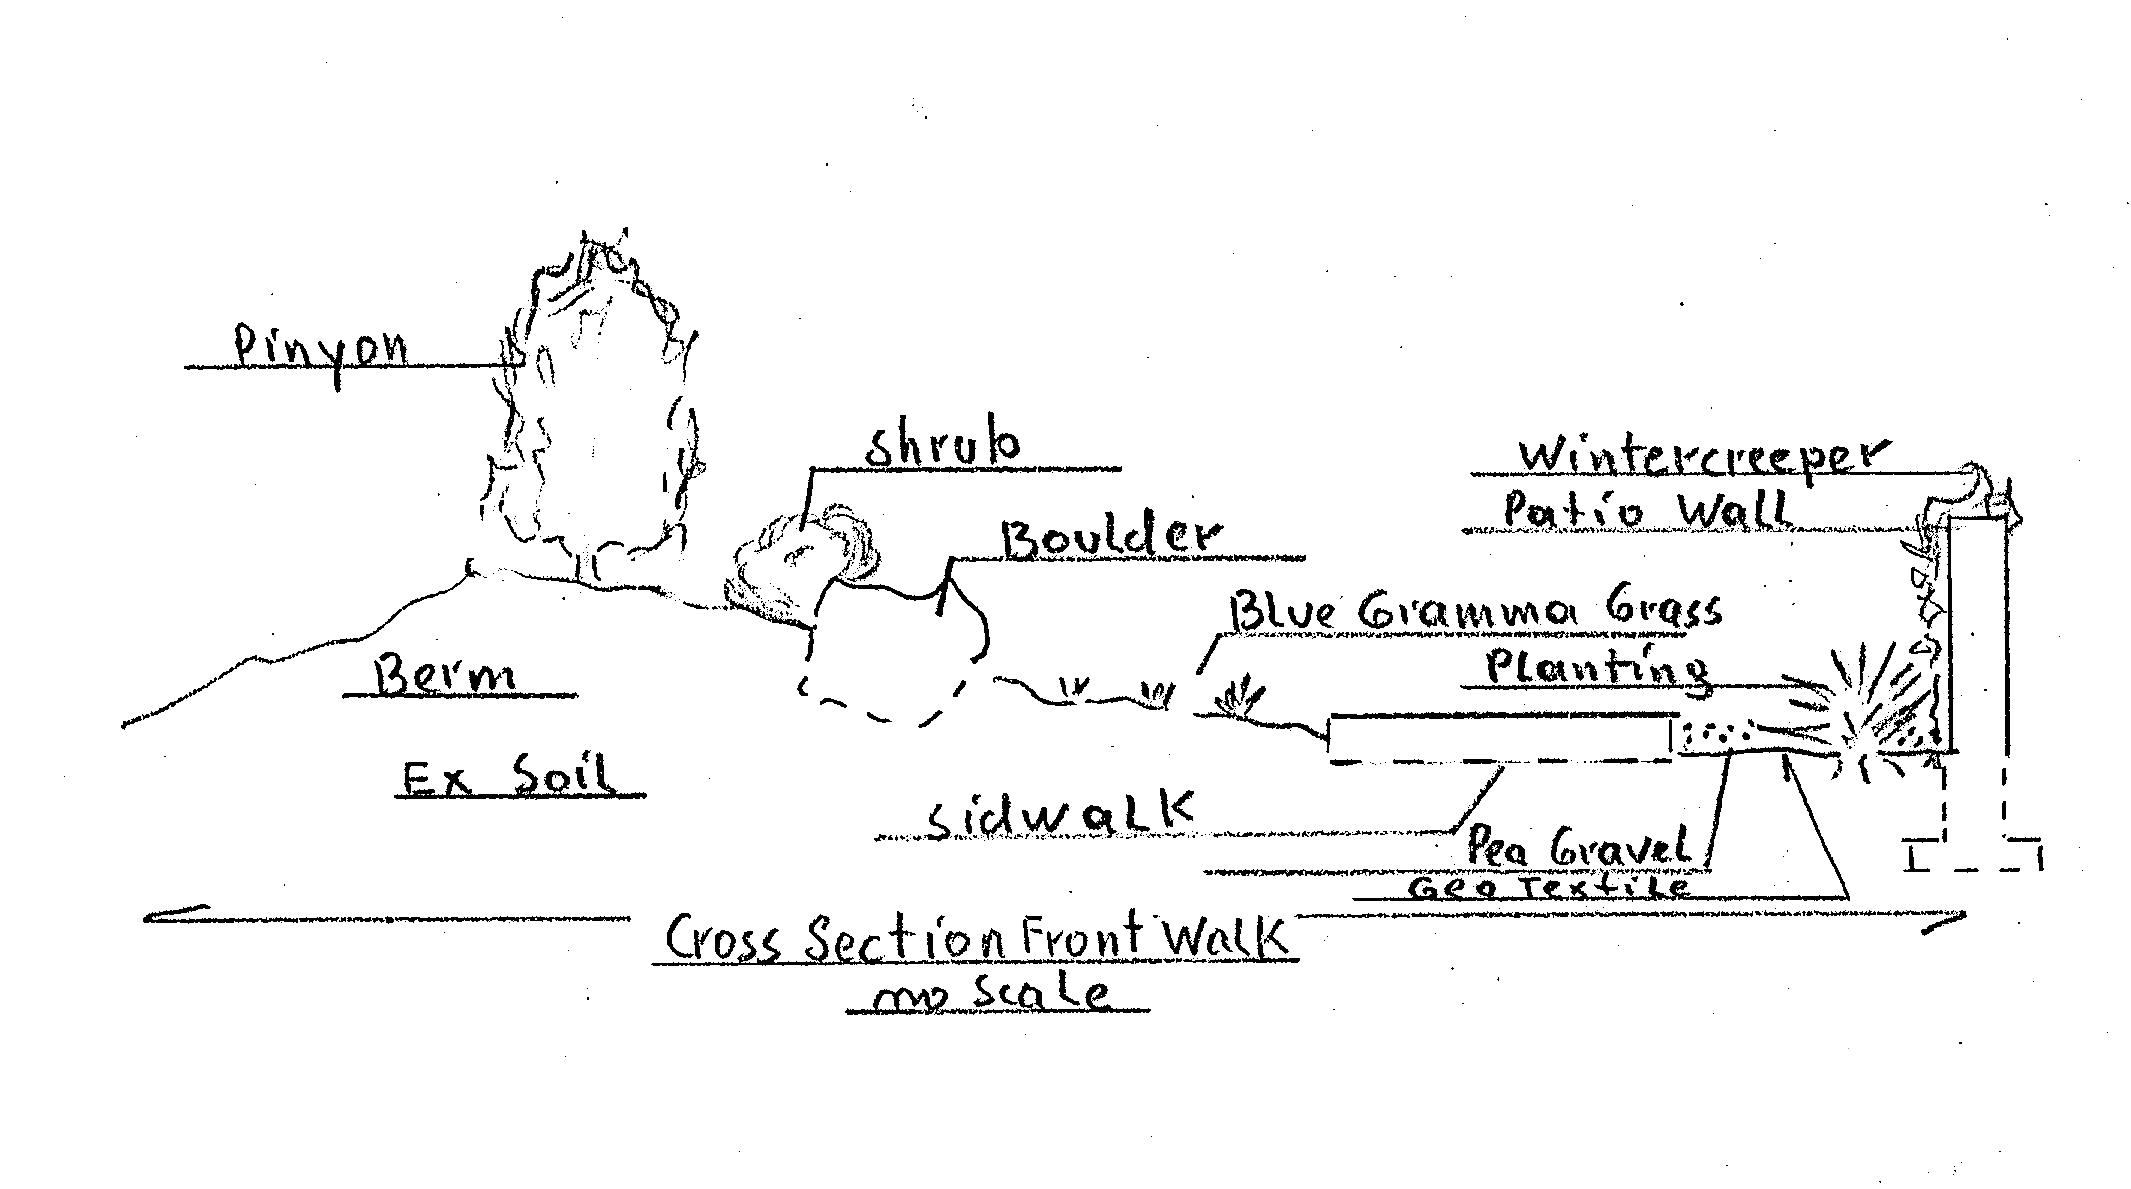 Colorado Springs Irma Entwurf 1978 Christiansen residence_detail_2.jpg